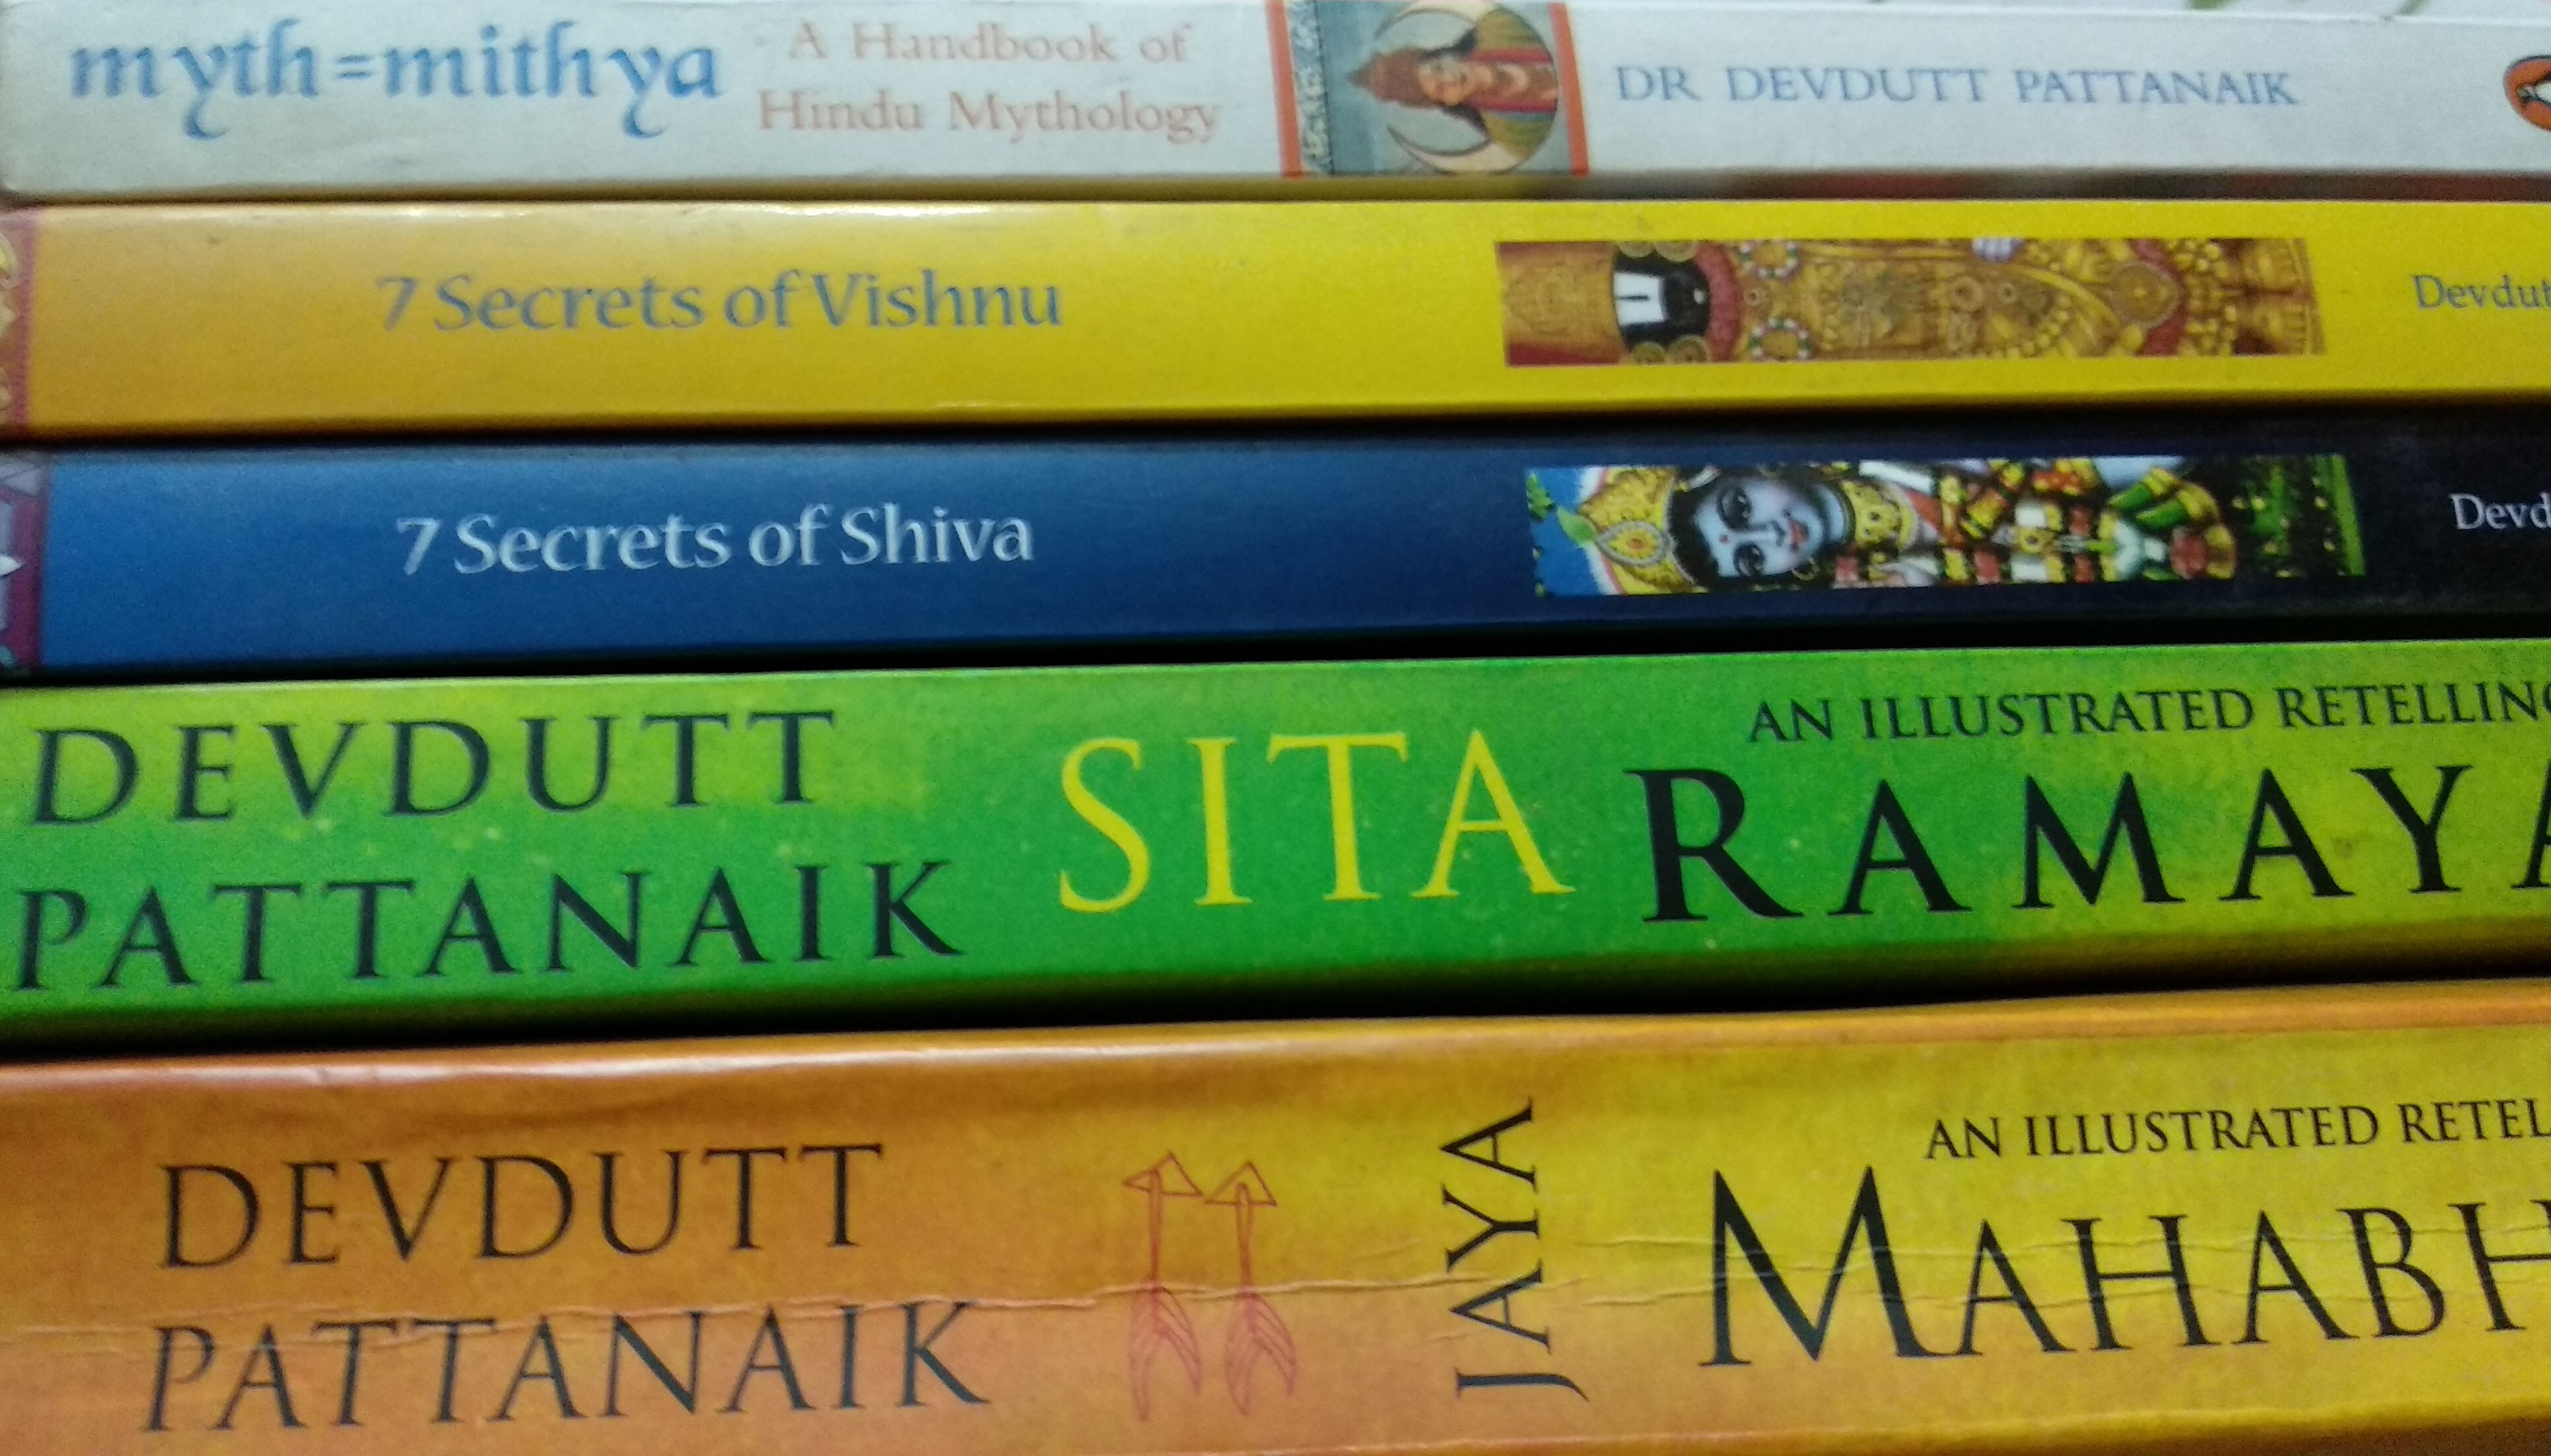 7 Secrets Of Shiva By Devdutt Pattanaik Pdf Download